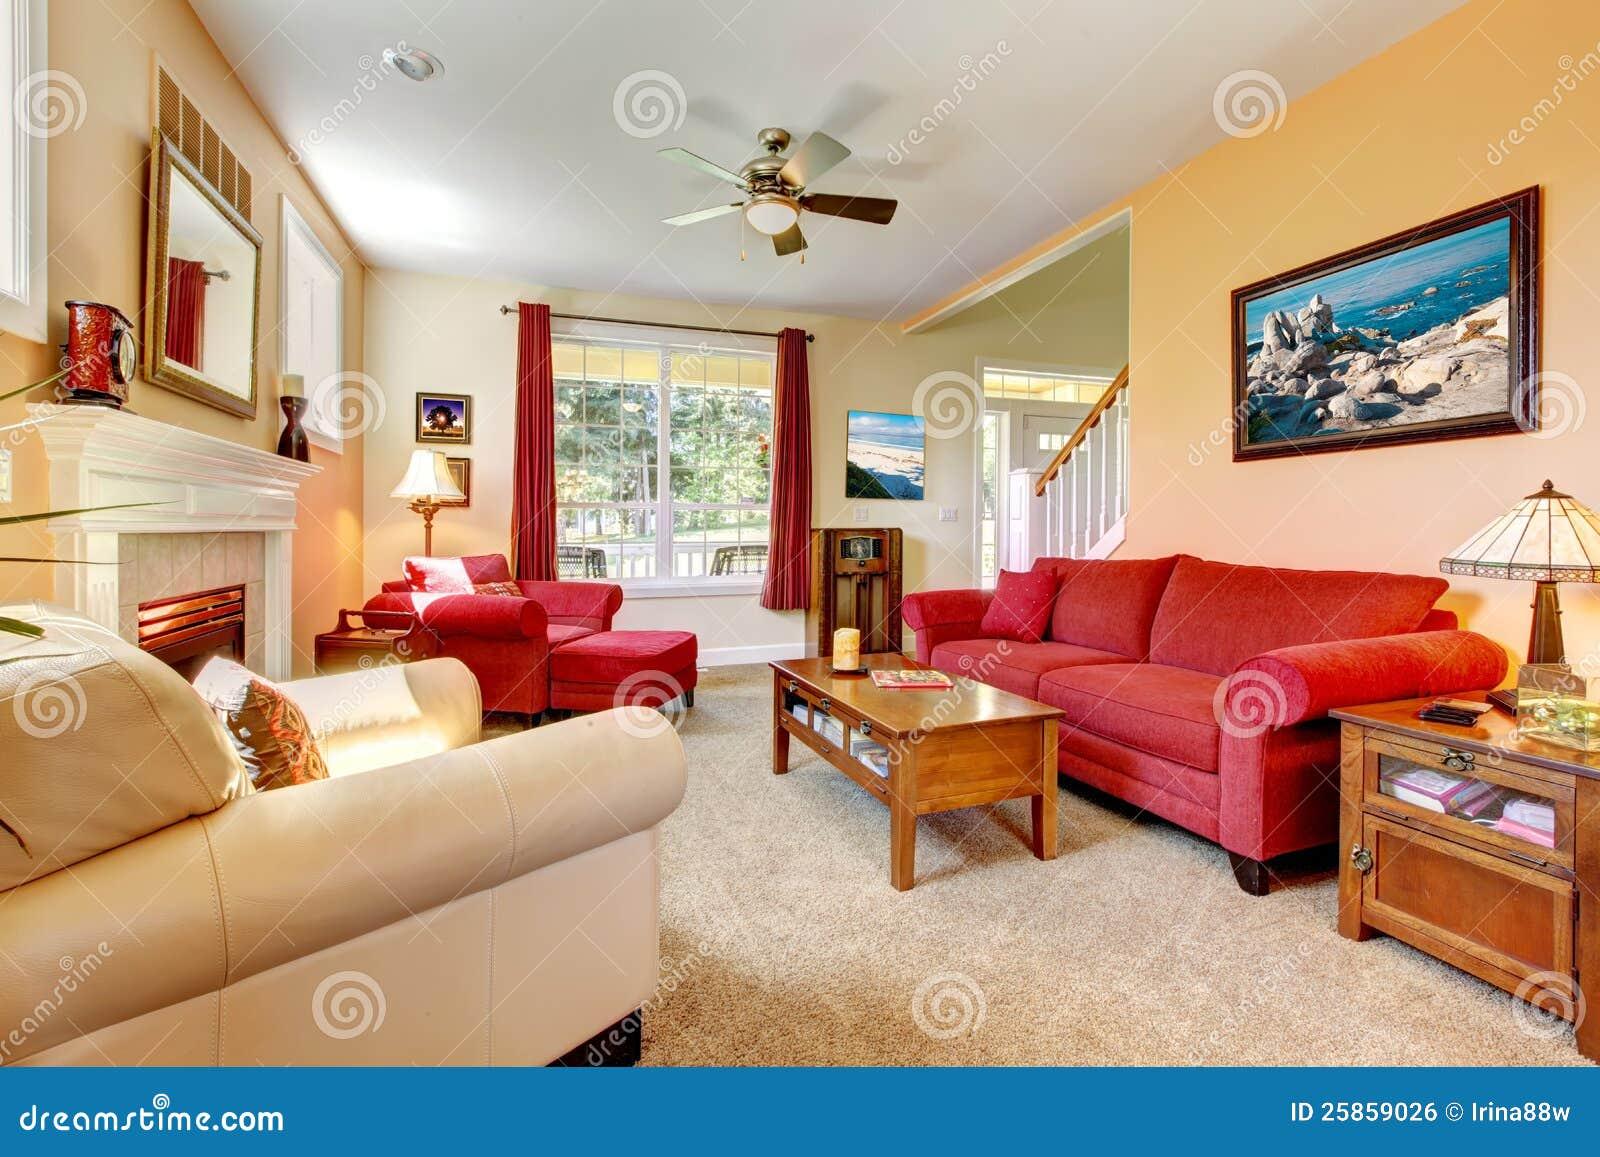 Perzik en rode mooie woonkamer royalty vrije stock afbeelding ...